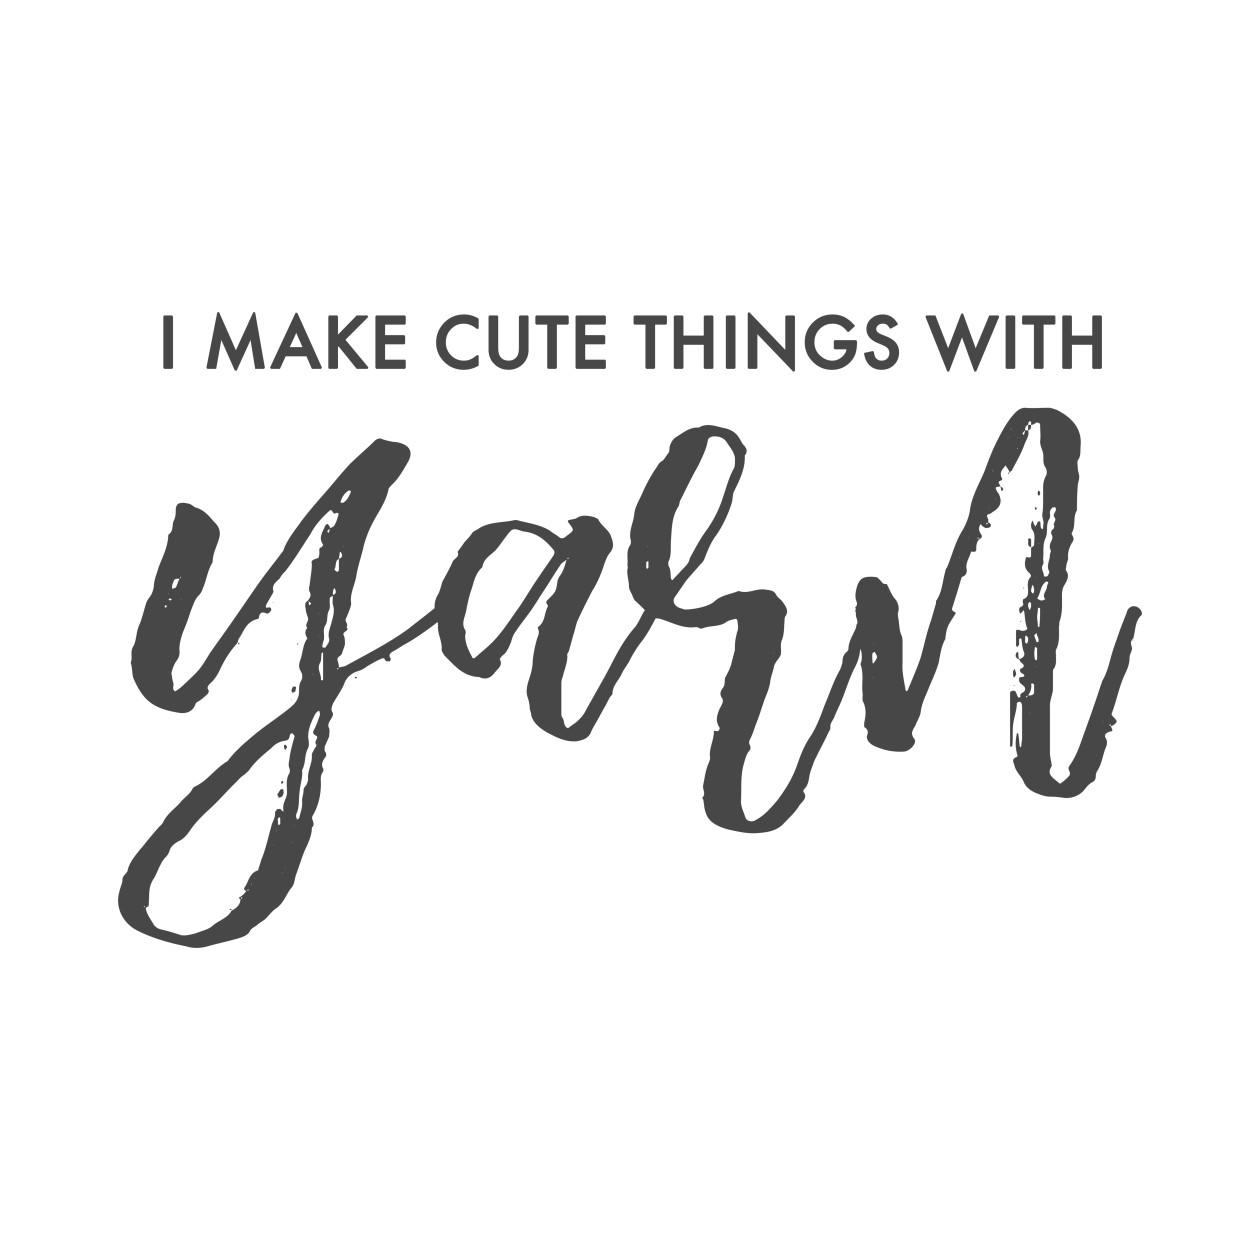 I Make Cute Things with Yarn Shirt